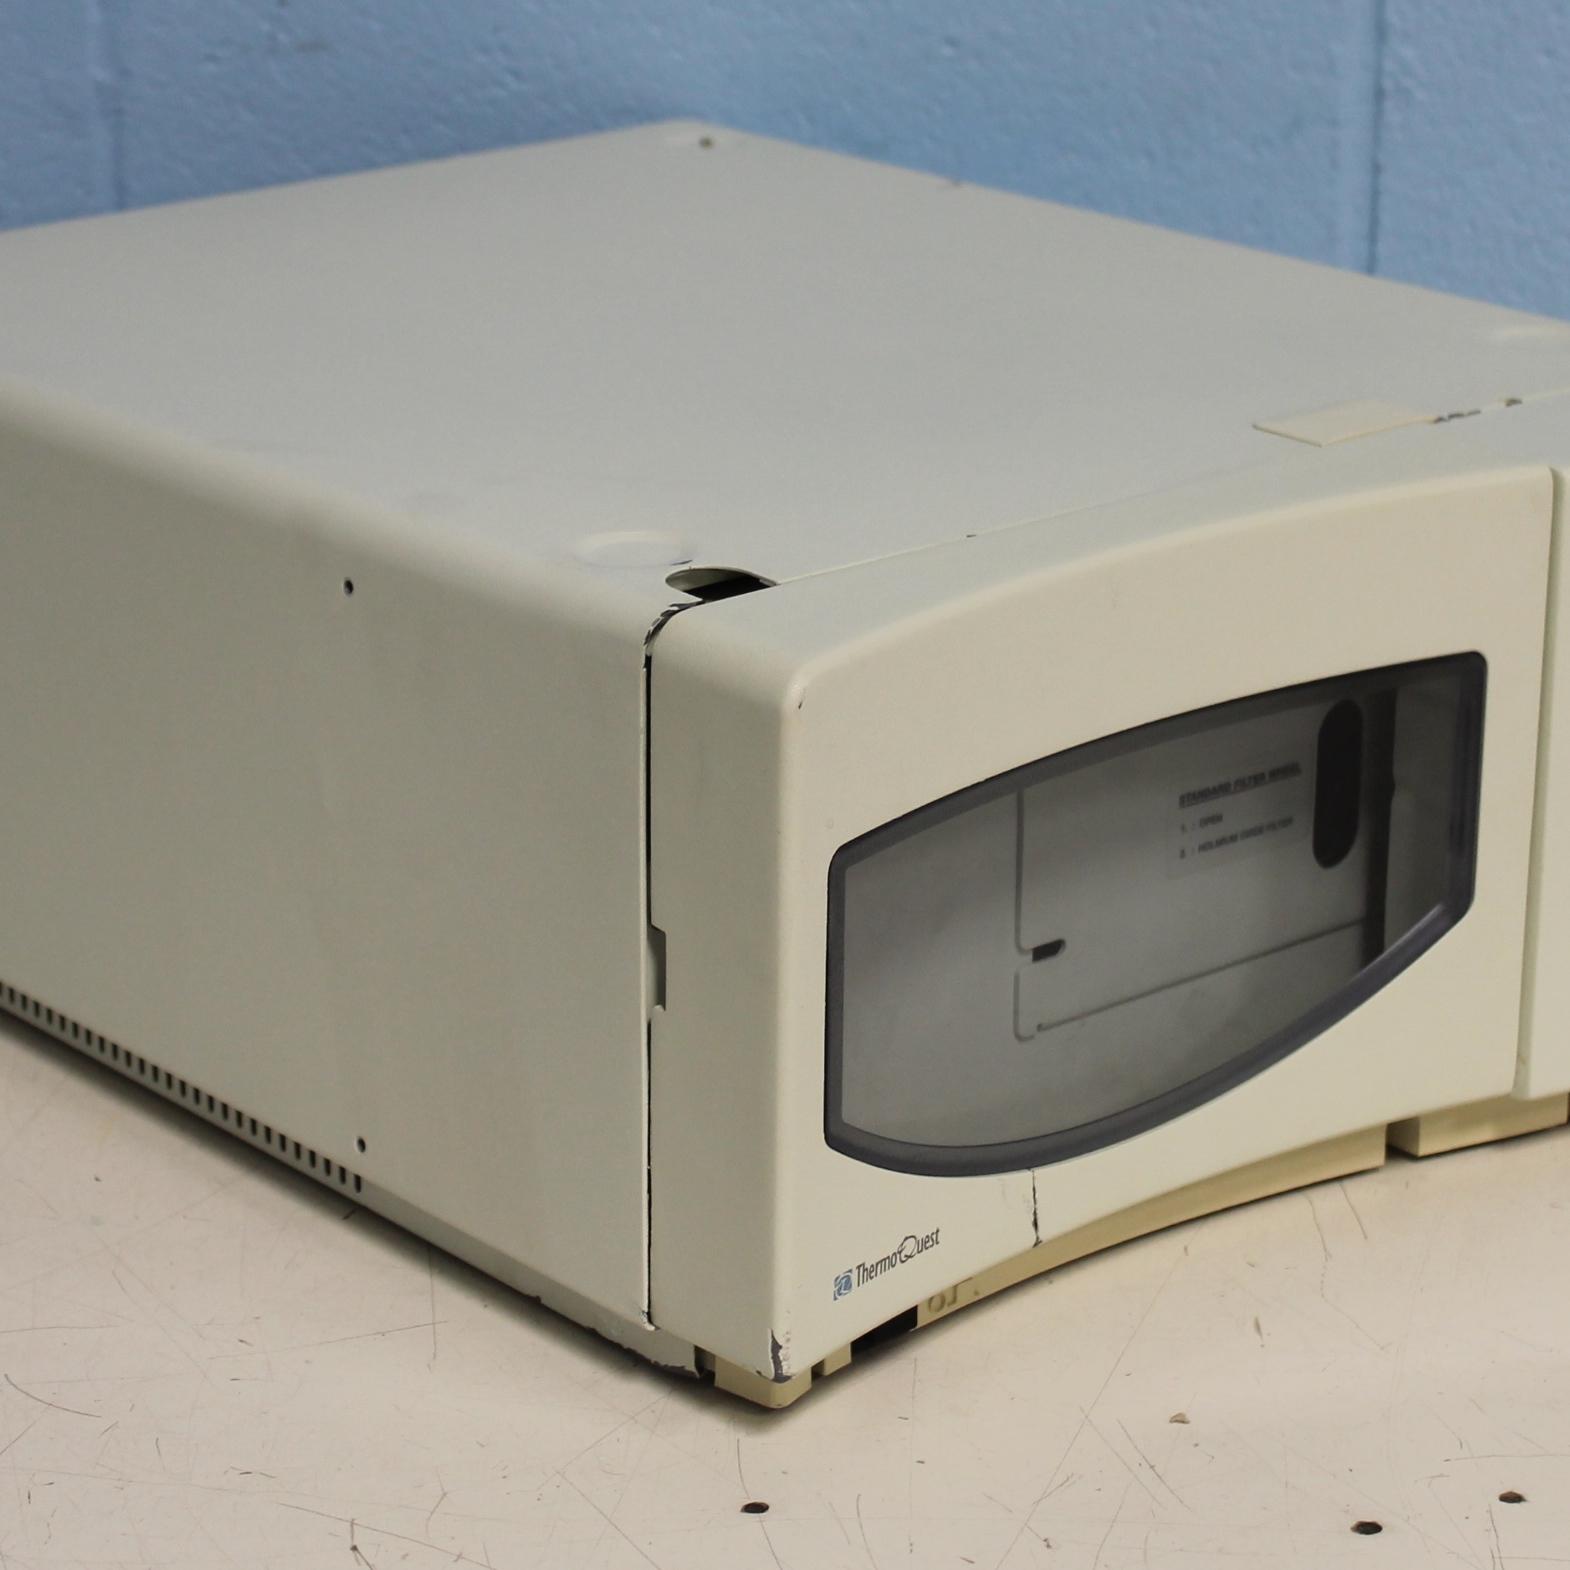 Thermoquest Surveyor PDA Detector Image